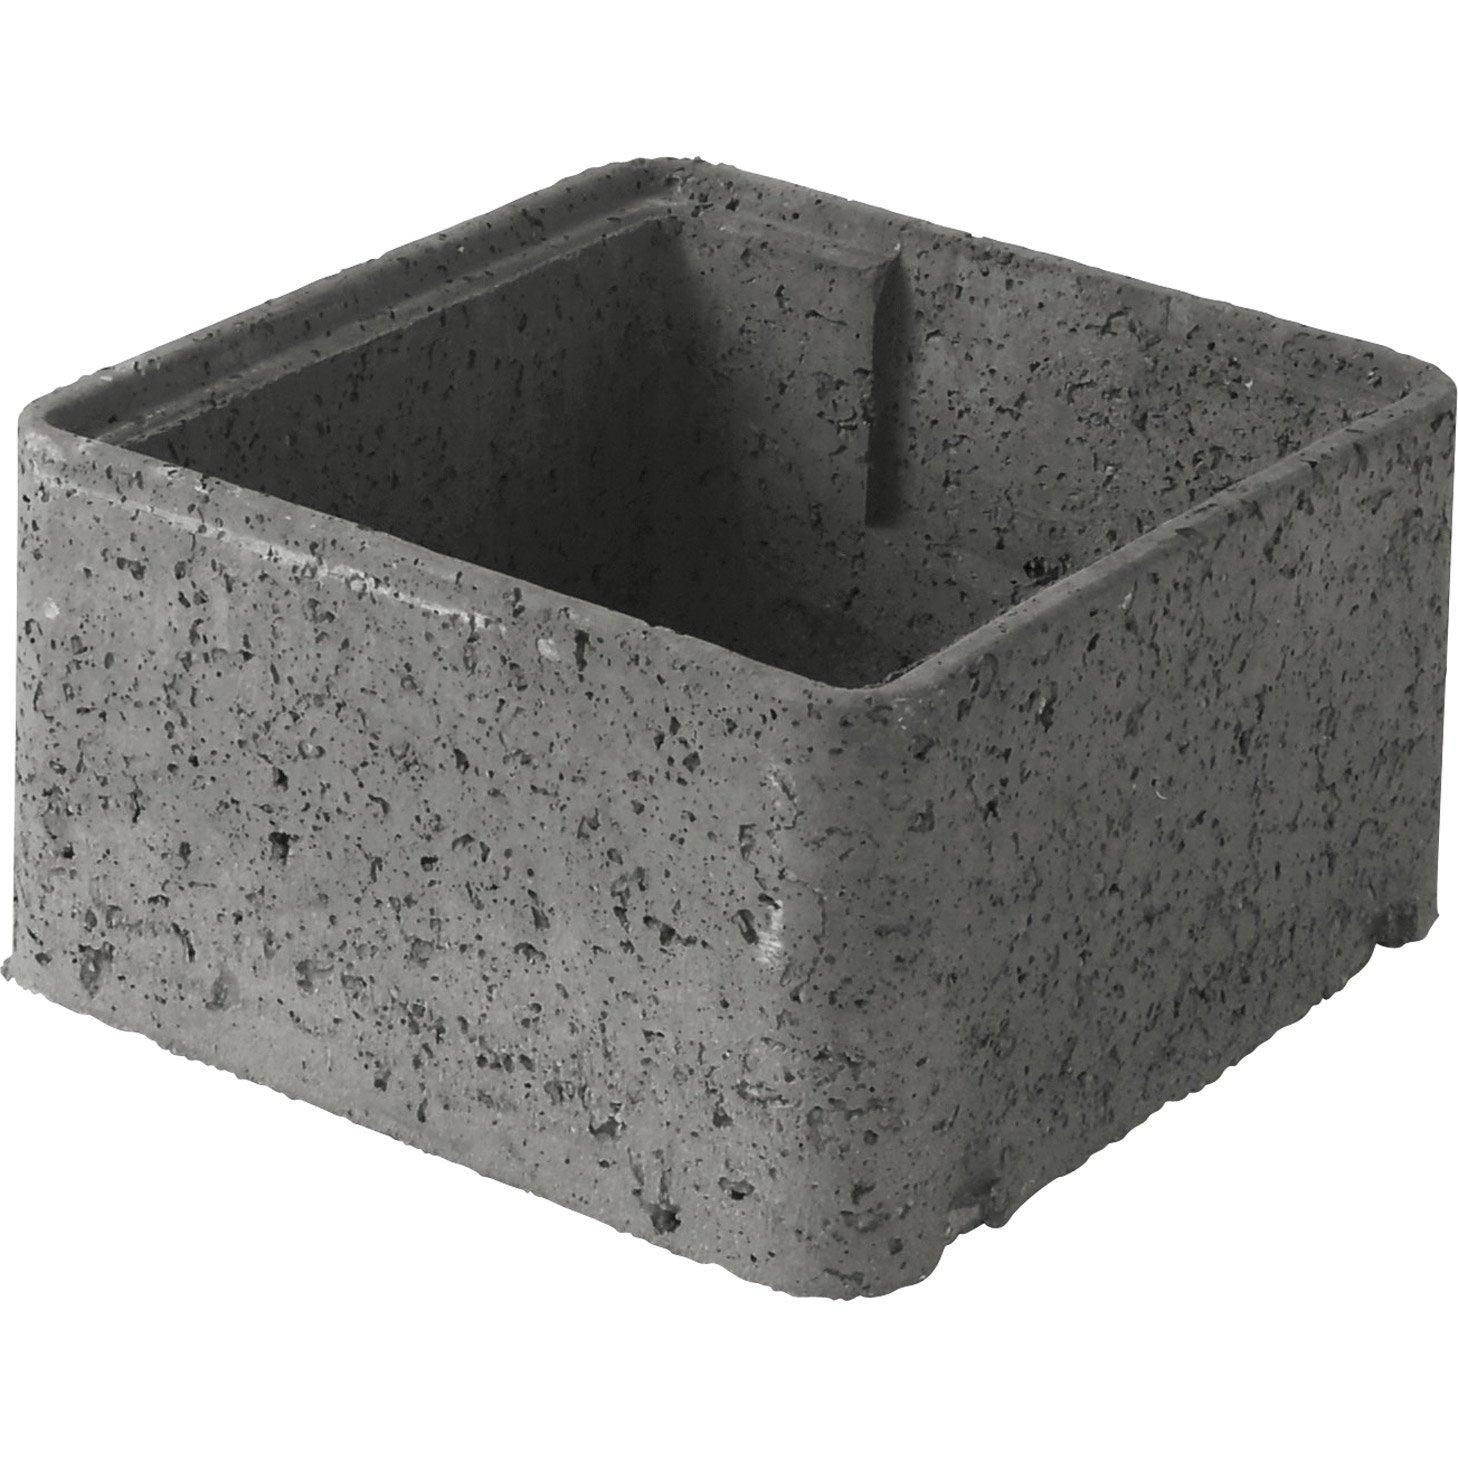 Rehausse de regard b ton 36x36x33 cm leroy merlin - Livraison beton leroy merlin ...